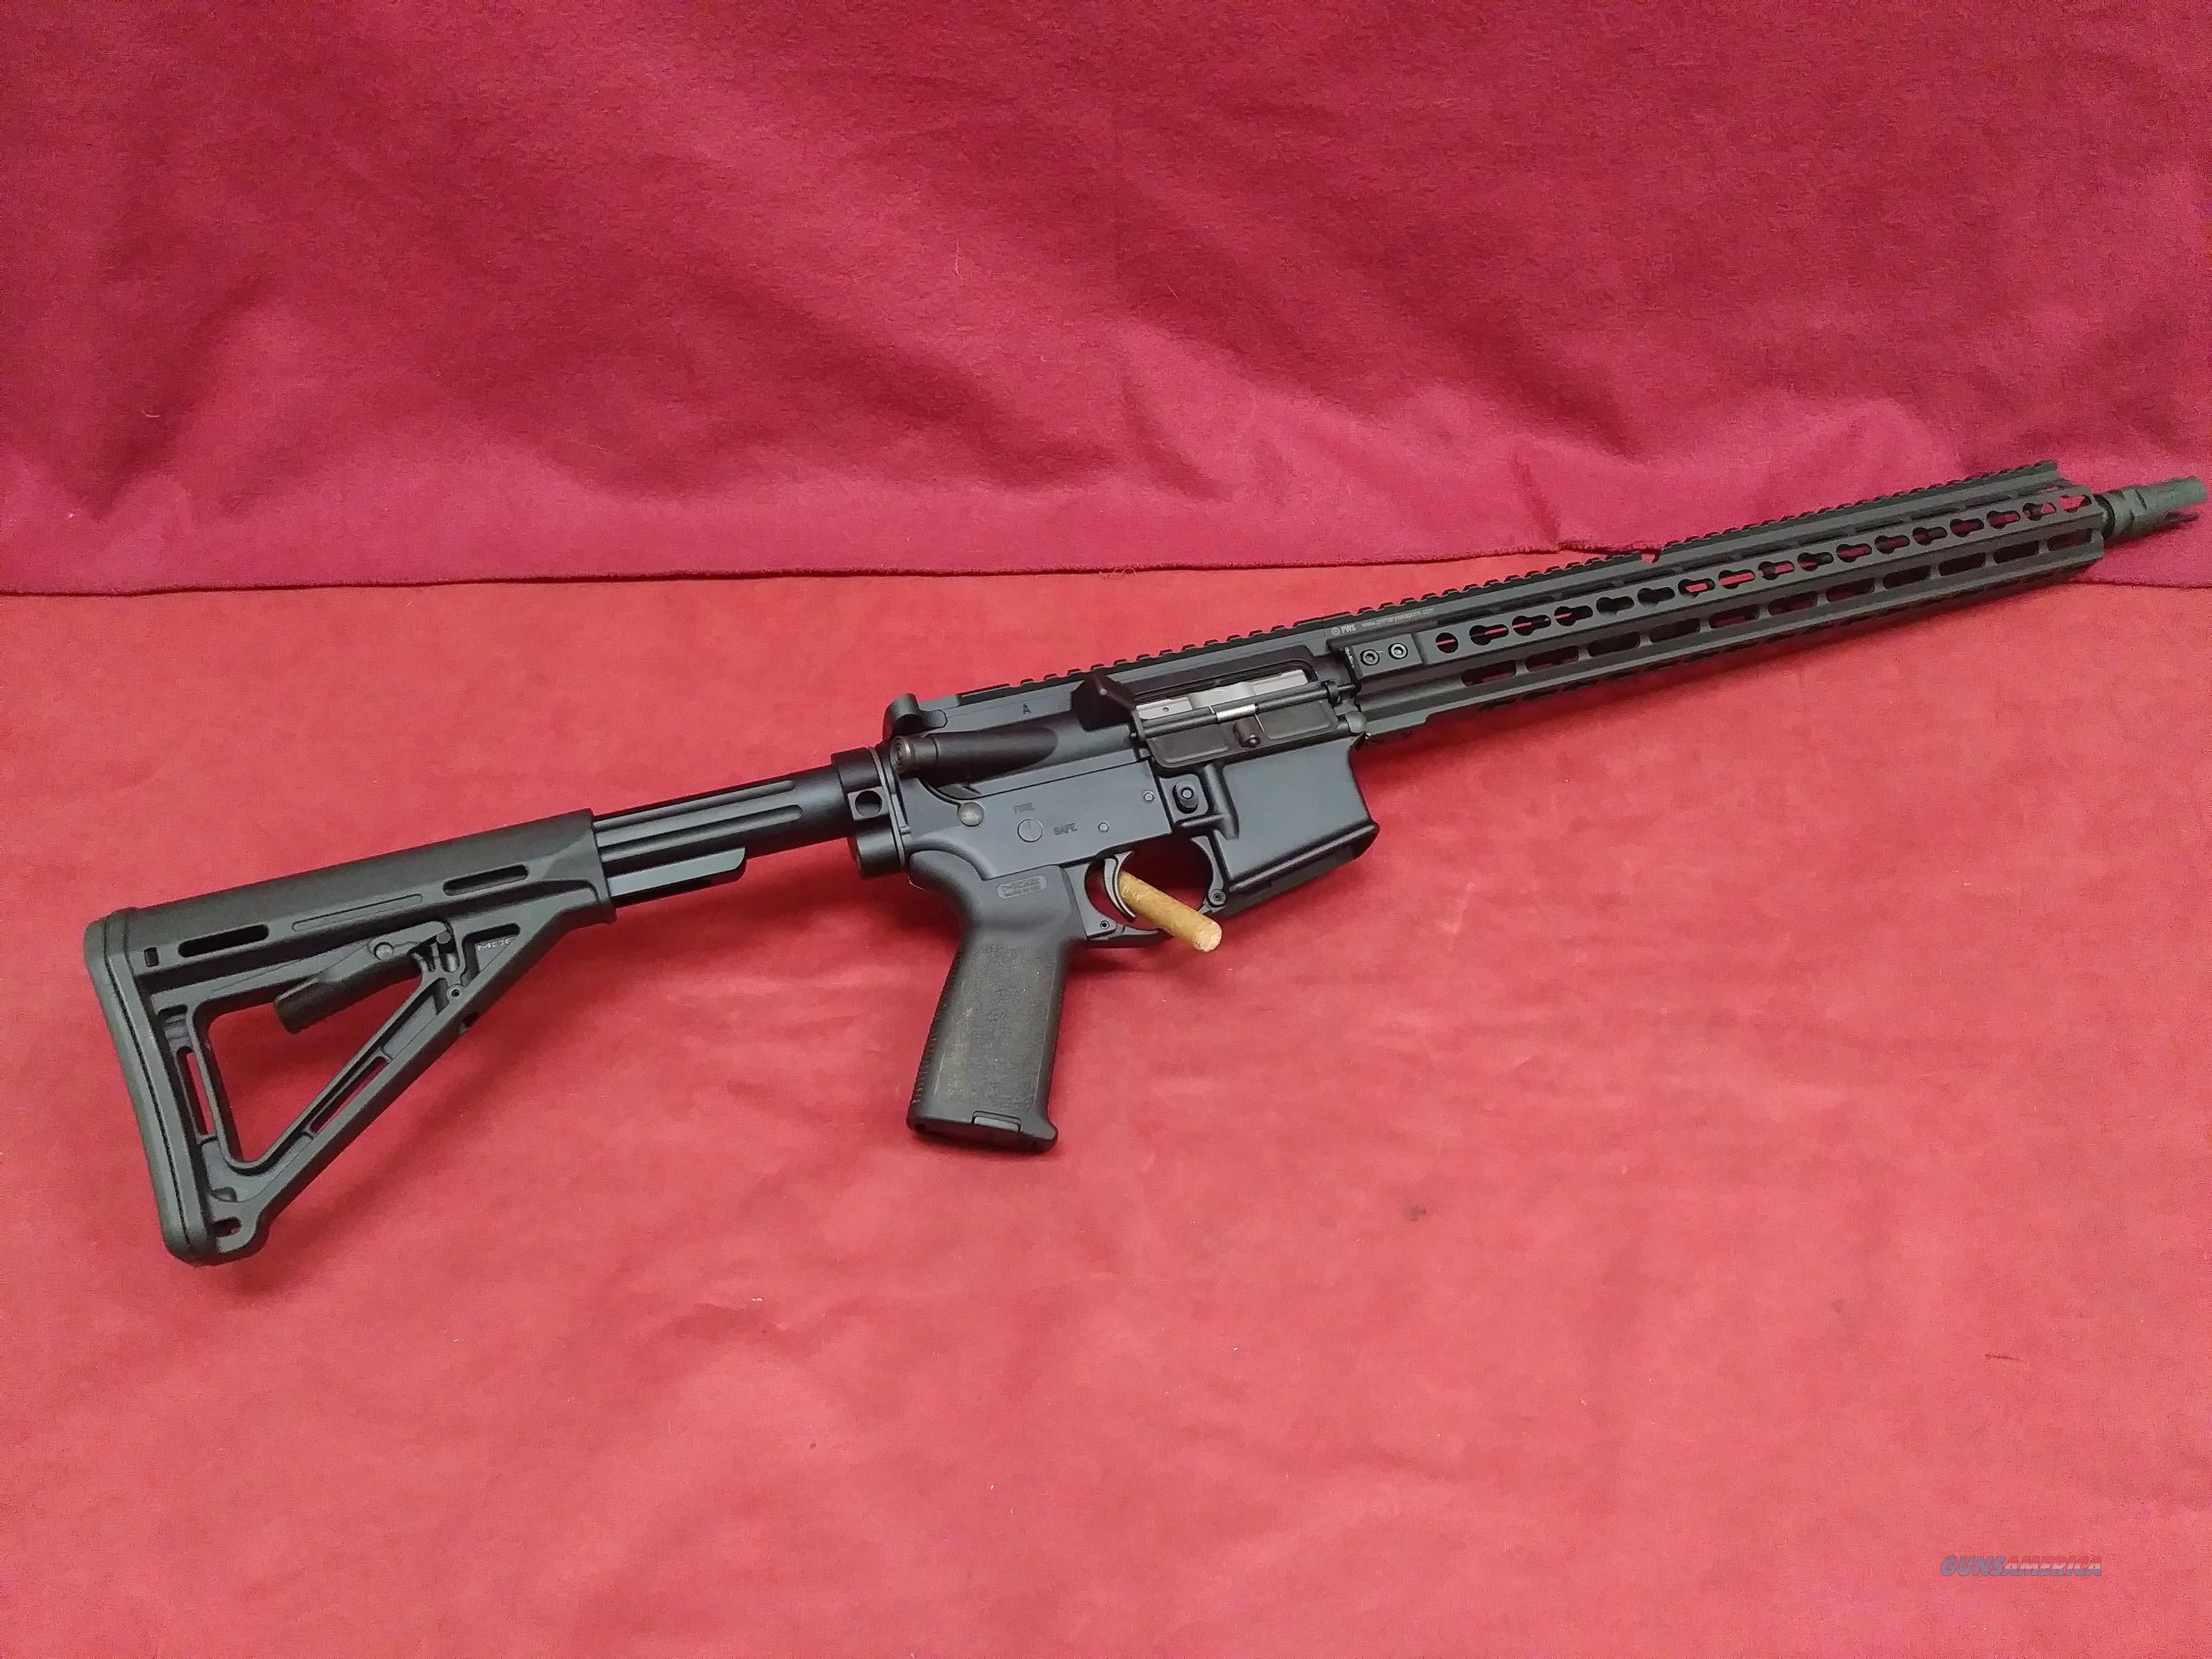 Primary Weapon Systems MK1, .300 Blackout  Guns > Rifles > Custom Rifles > AR-15 Family